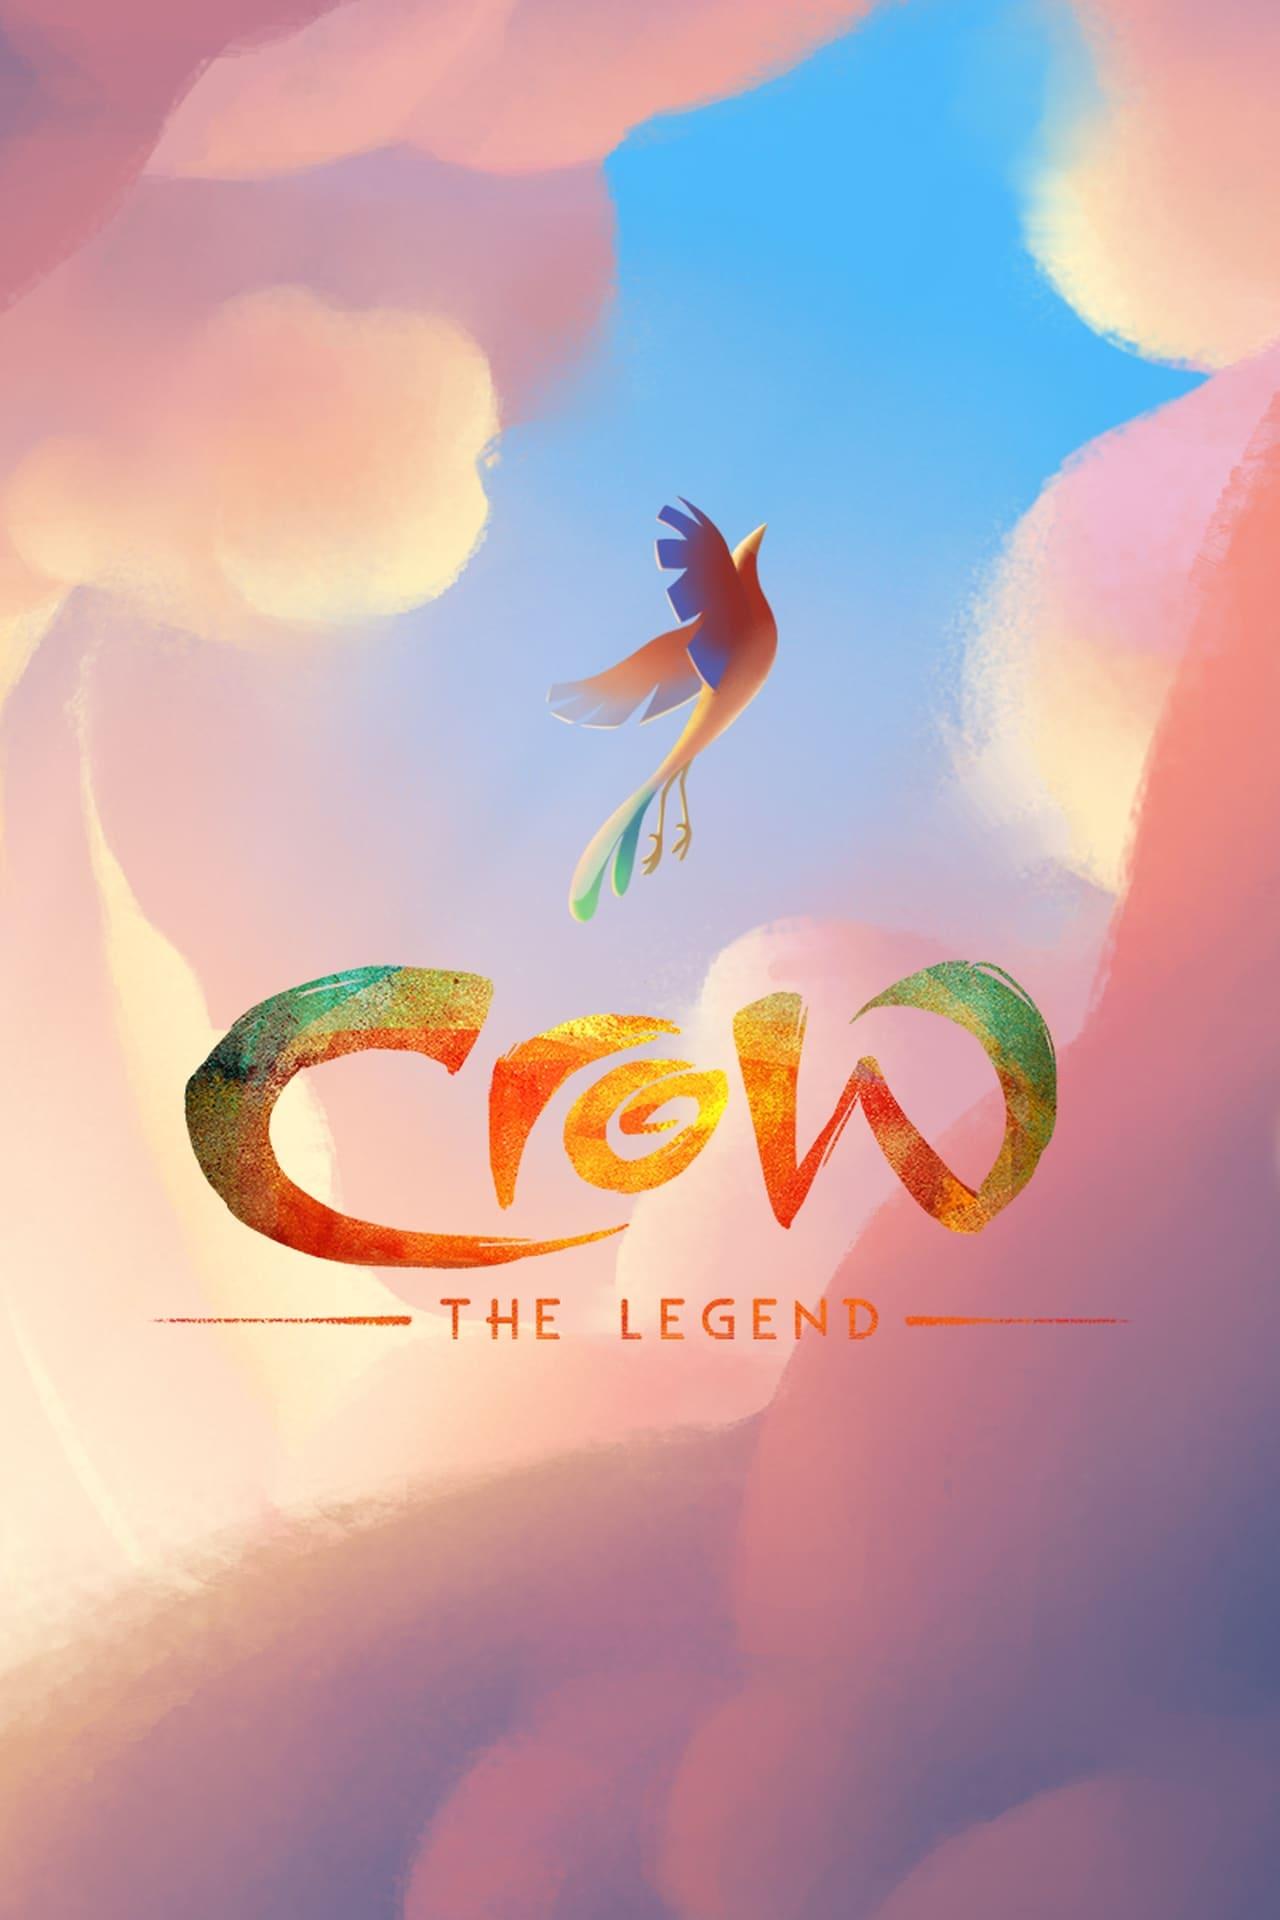 Crow: The Legend (2018)